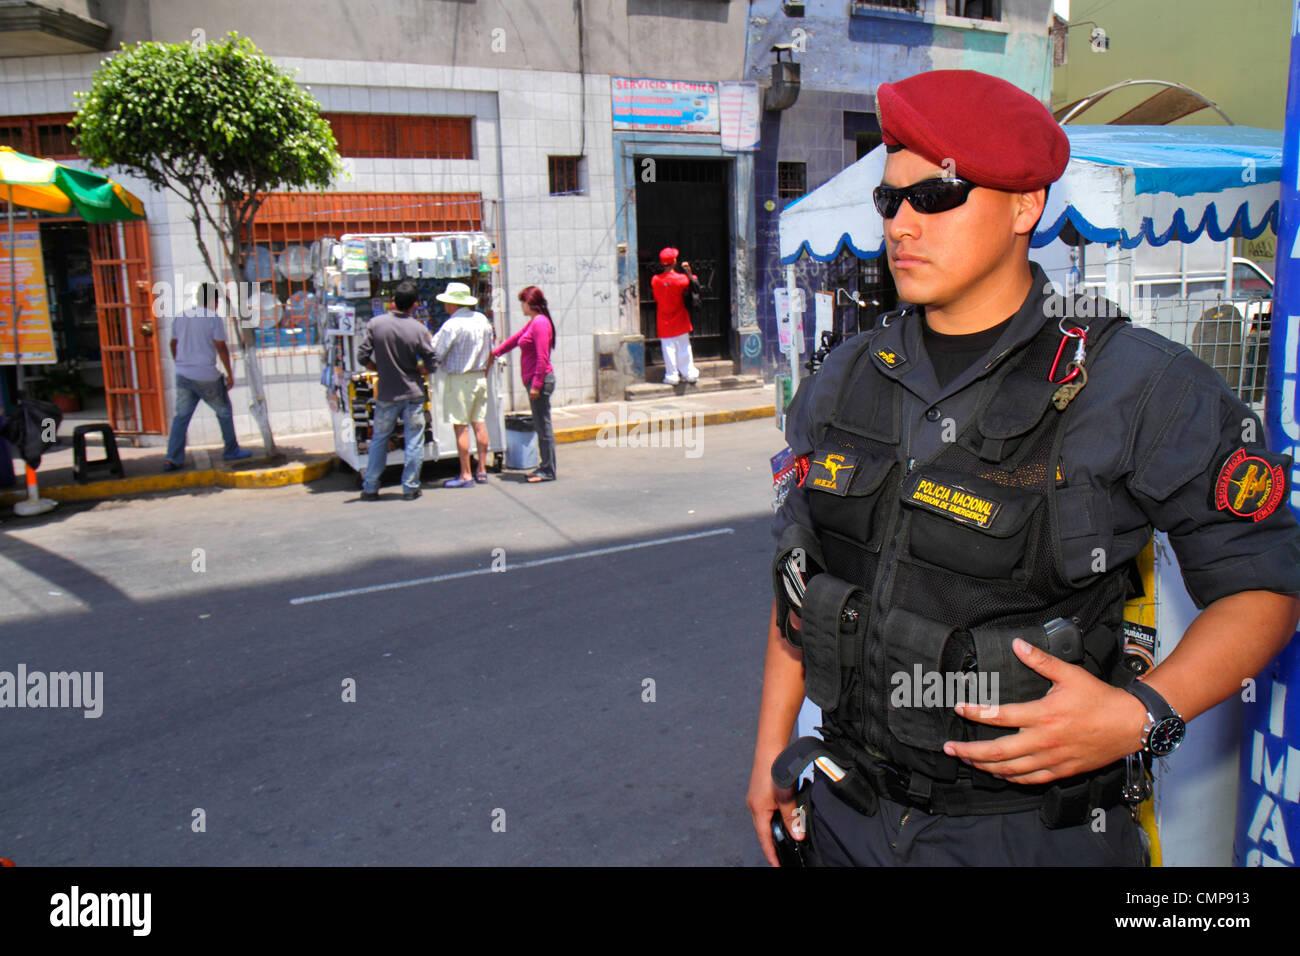 Lima Peru Surquillo Mercado de Surquillo street scene commercial district Hispanic national guard Policia Nacional - Stock Image